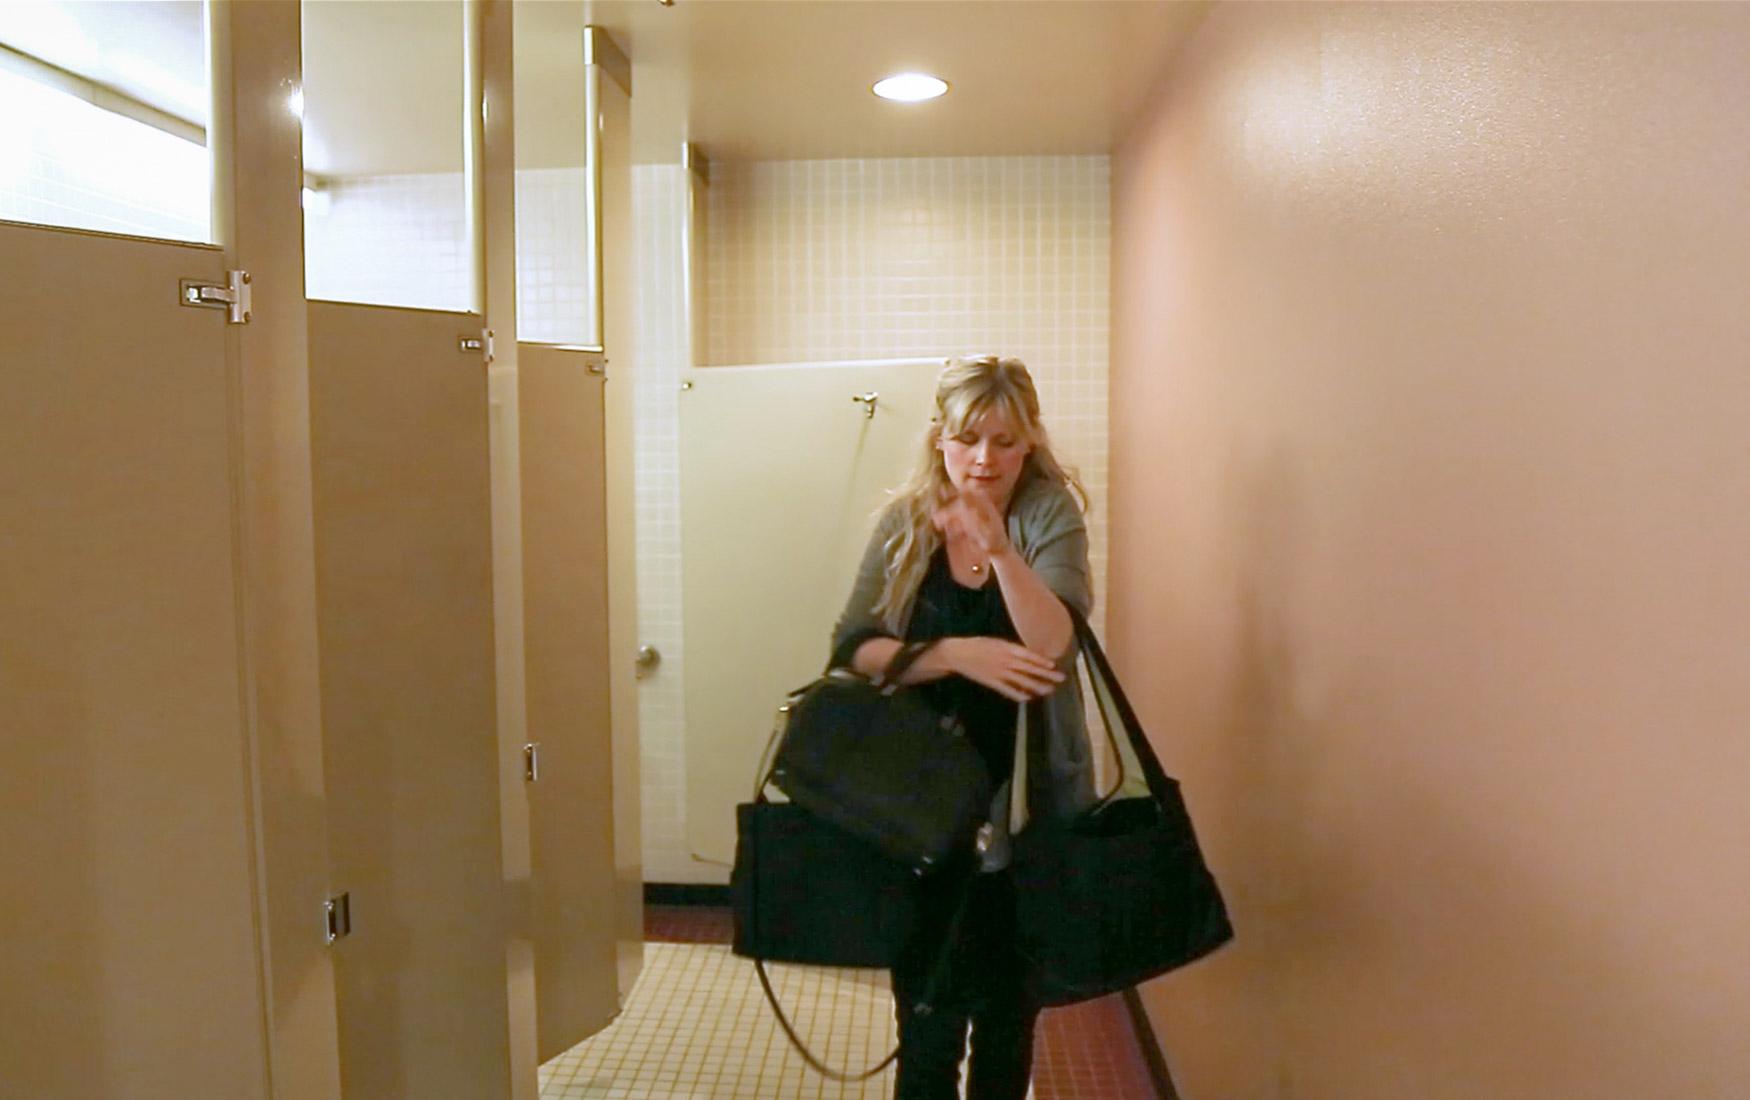 Mom leaving bathroom after pumping breast milk